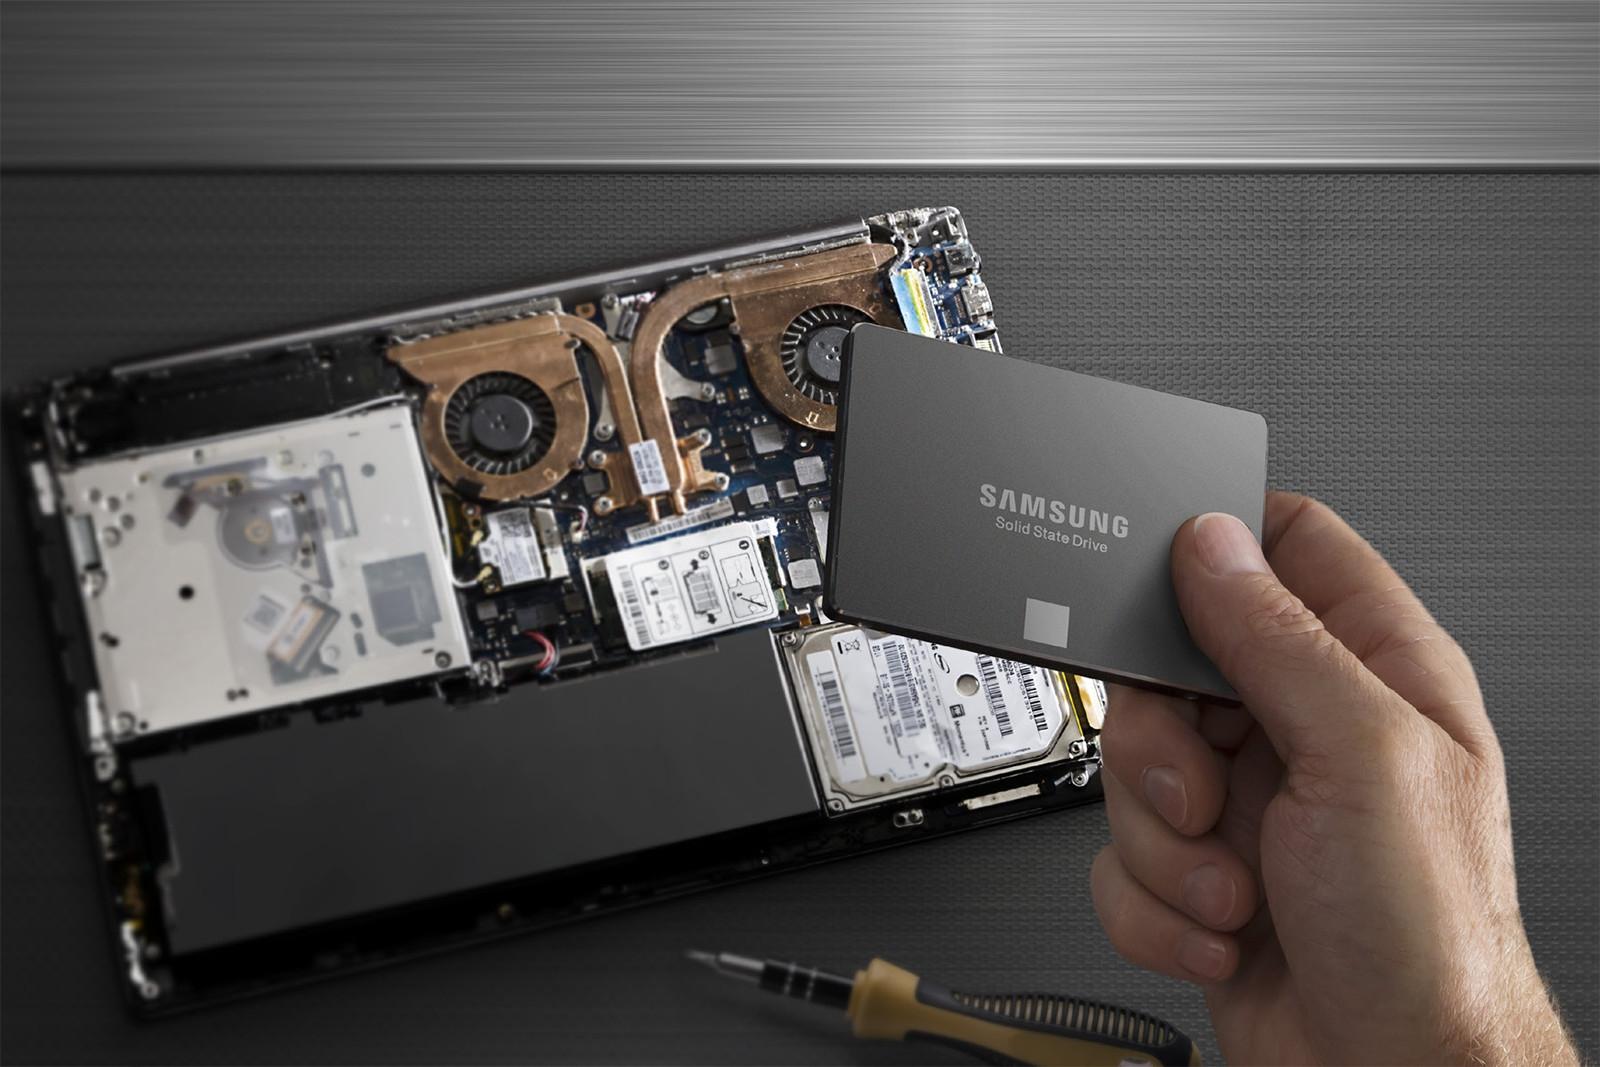 Samsung ssd 750 evo 120gb драйвер